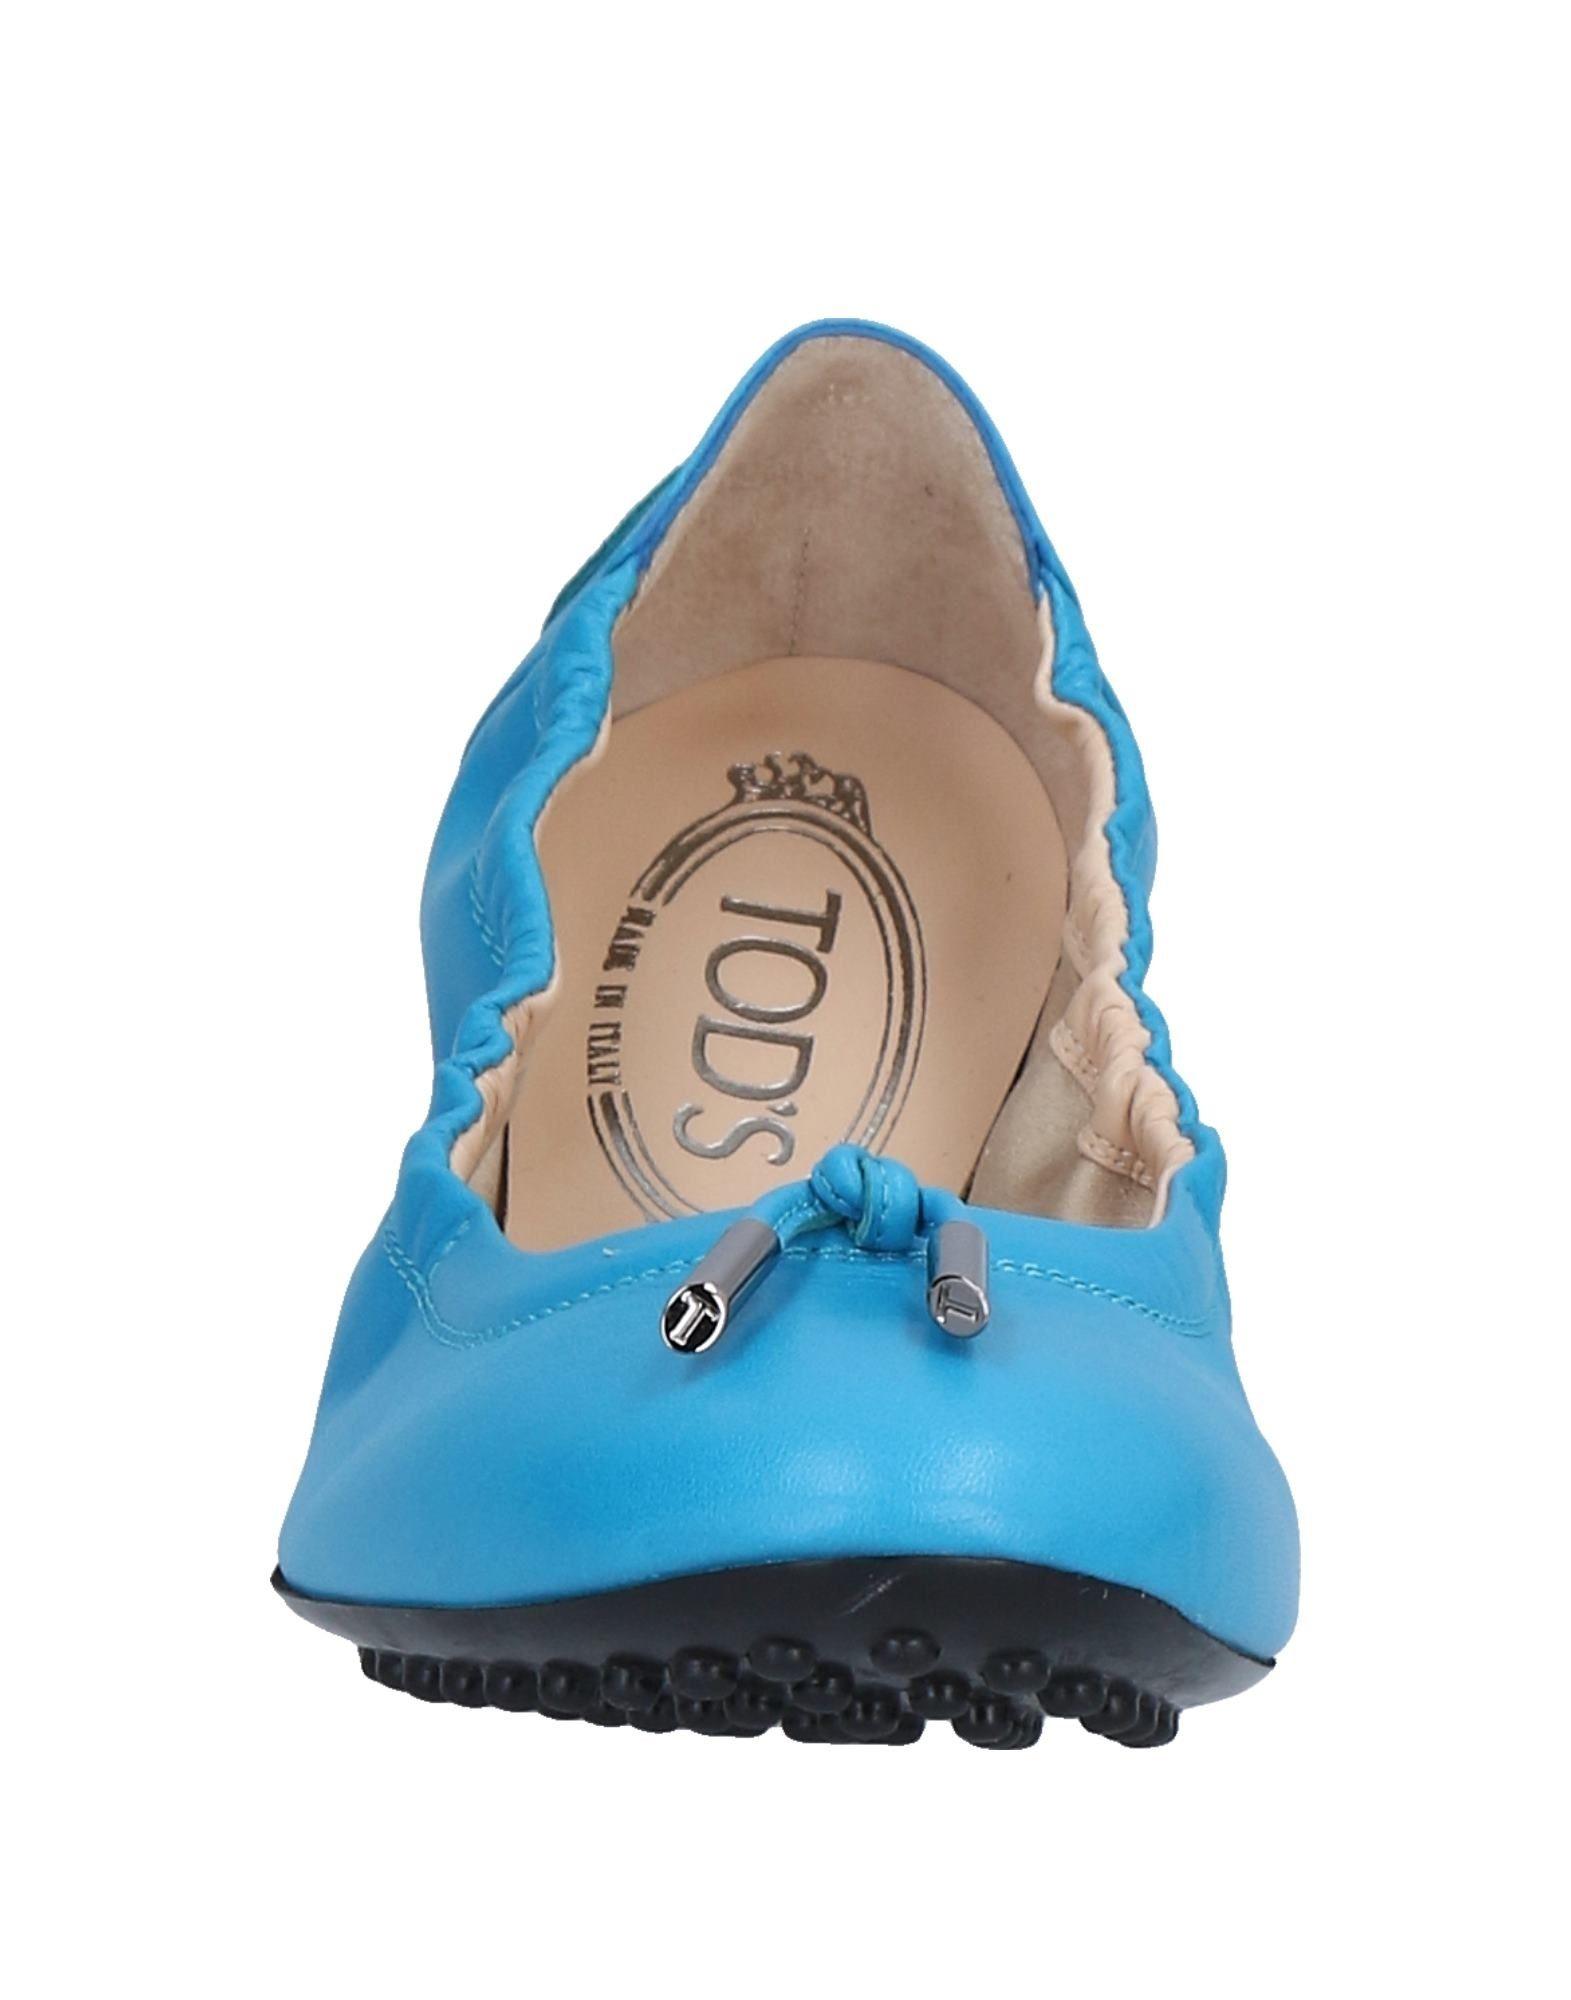 Tod's Ballet Flats - Women Women Women Tod's Ballet Flats online on  United Kingdom - 11435441OX 34bd13